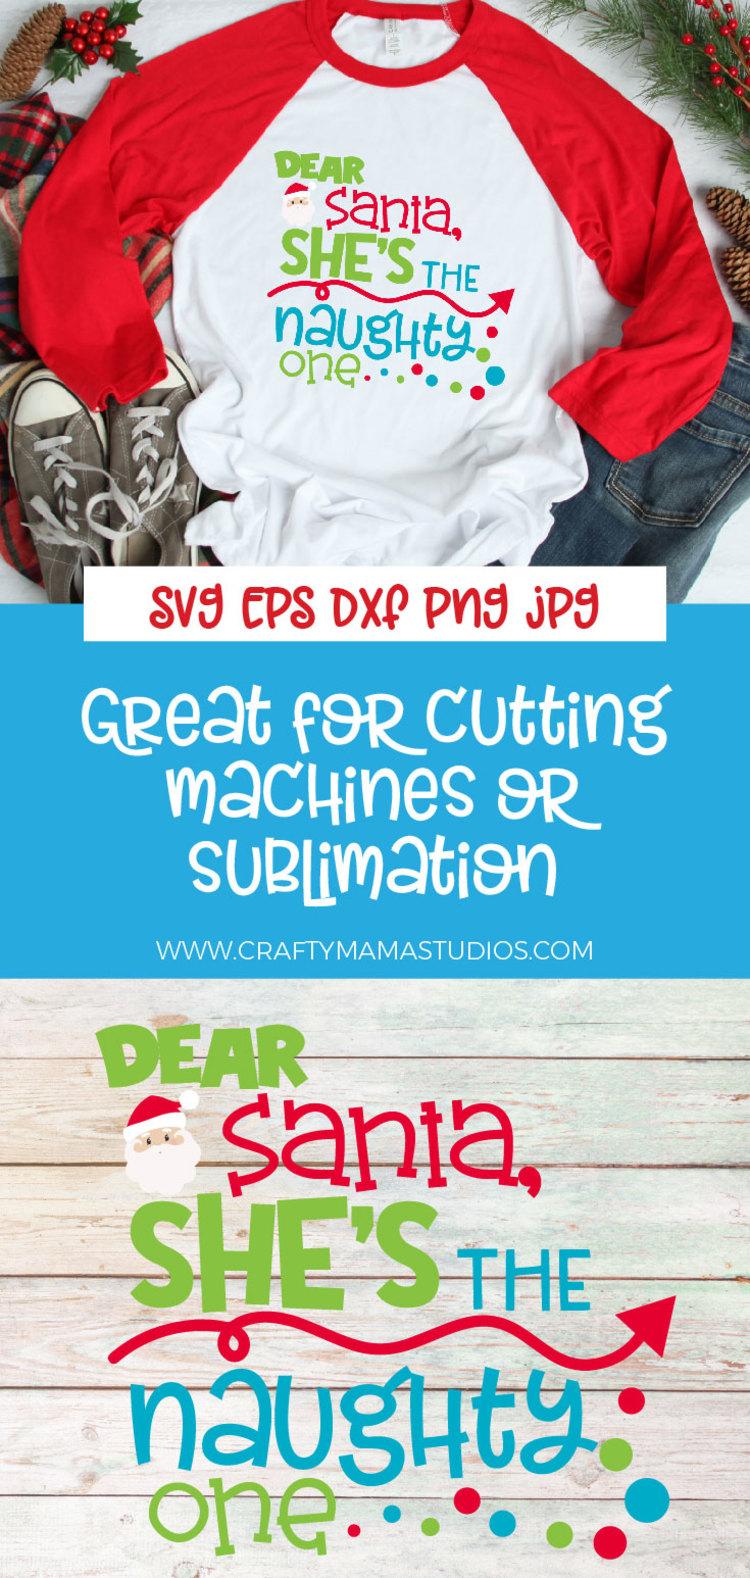 Naughty List, Dear Santa She's The Naughty One SVG Christmas example image 3